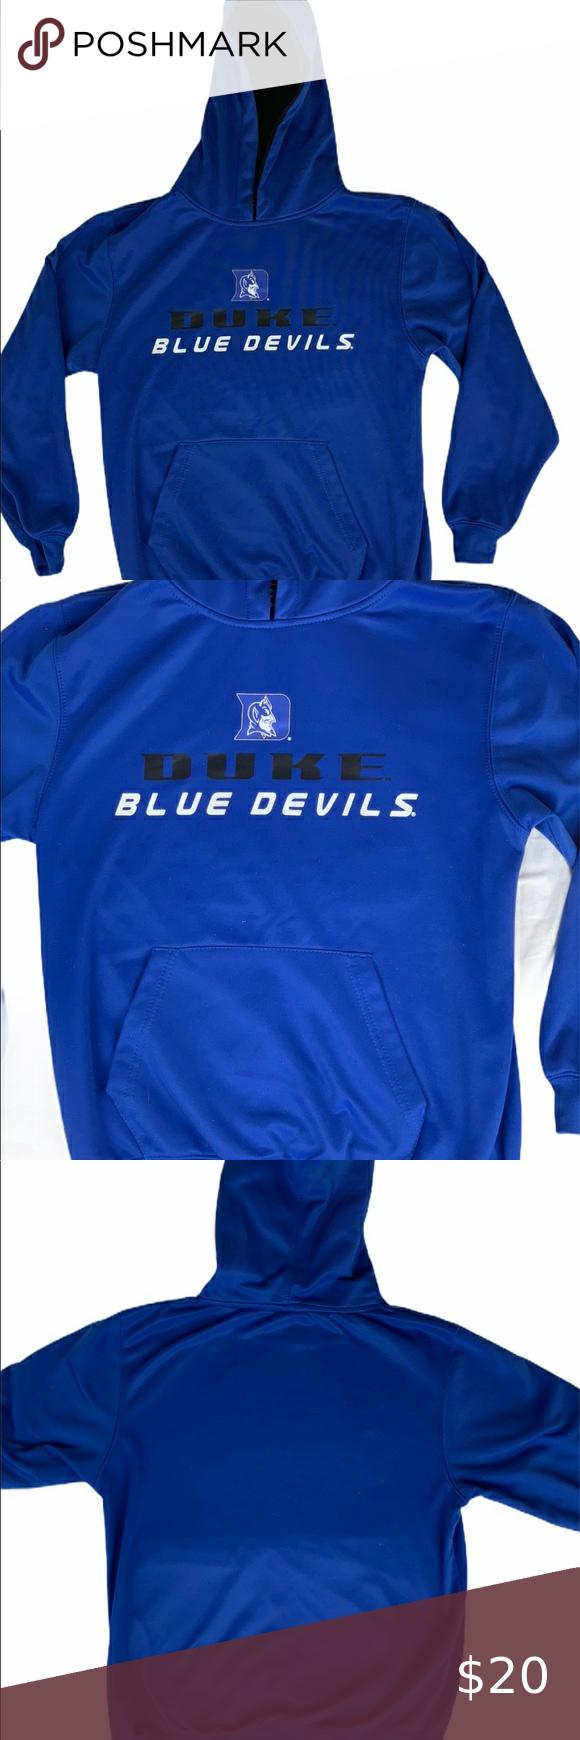 Youth Duke Blue Devils Hoodie Hooded Sweatshirt Brand Stadium Athletics Size M 12 14 Color Blue Condition Sweatshirts Hooded Sweatshirts Duke Blue Devils [ 1740 x 580 Pixel ]